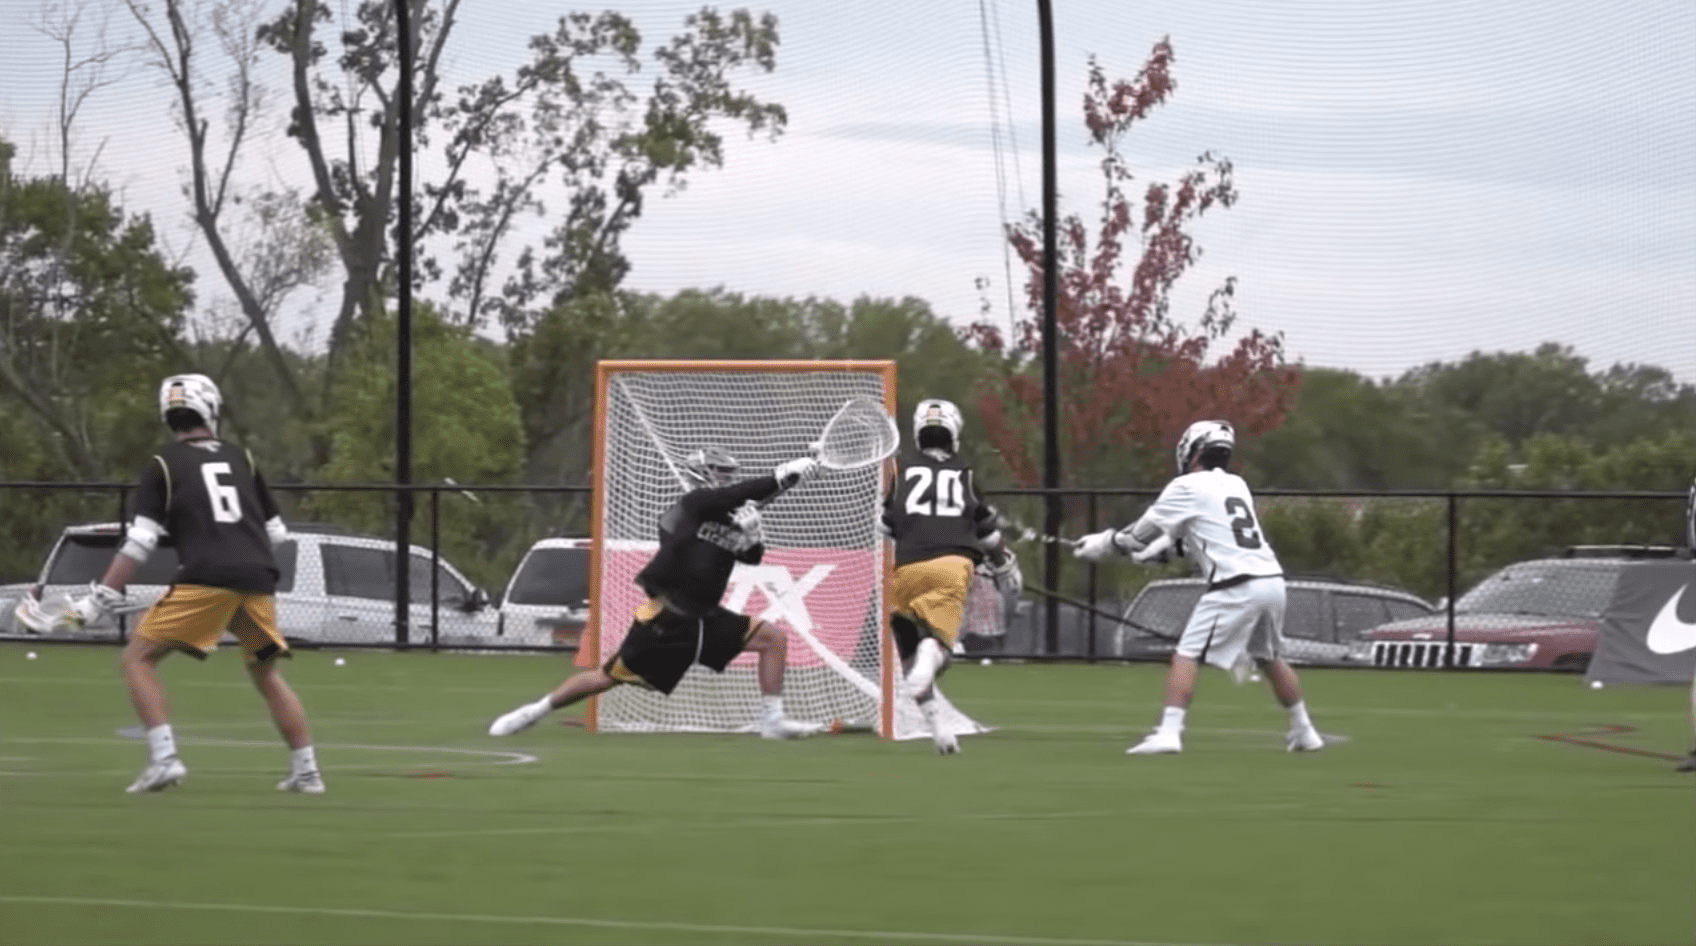 lacrosse goalie save montage